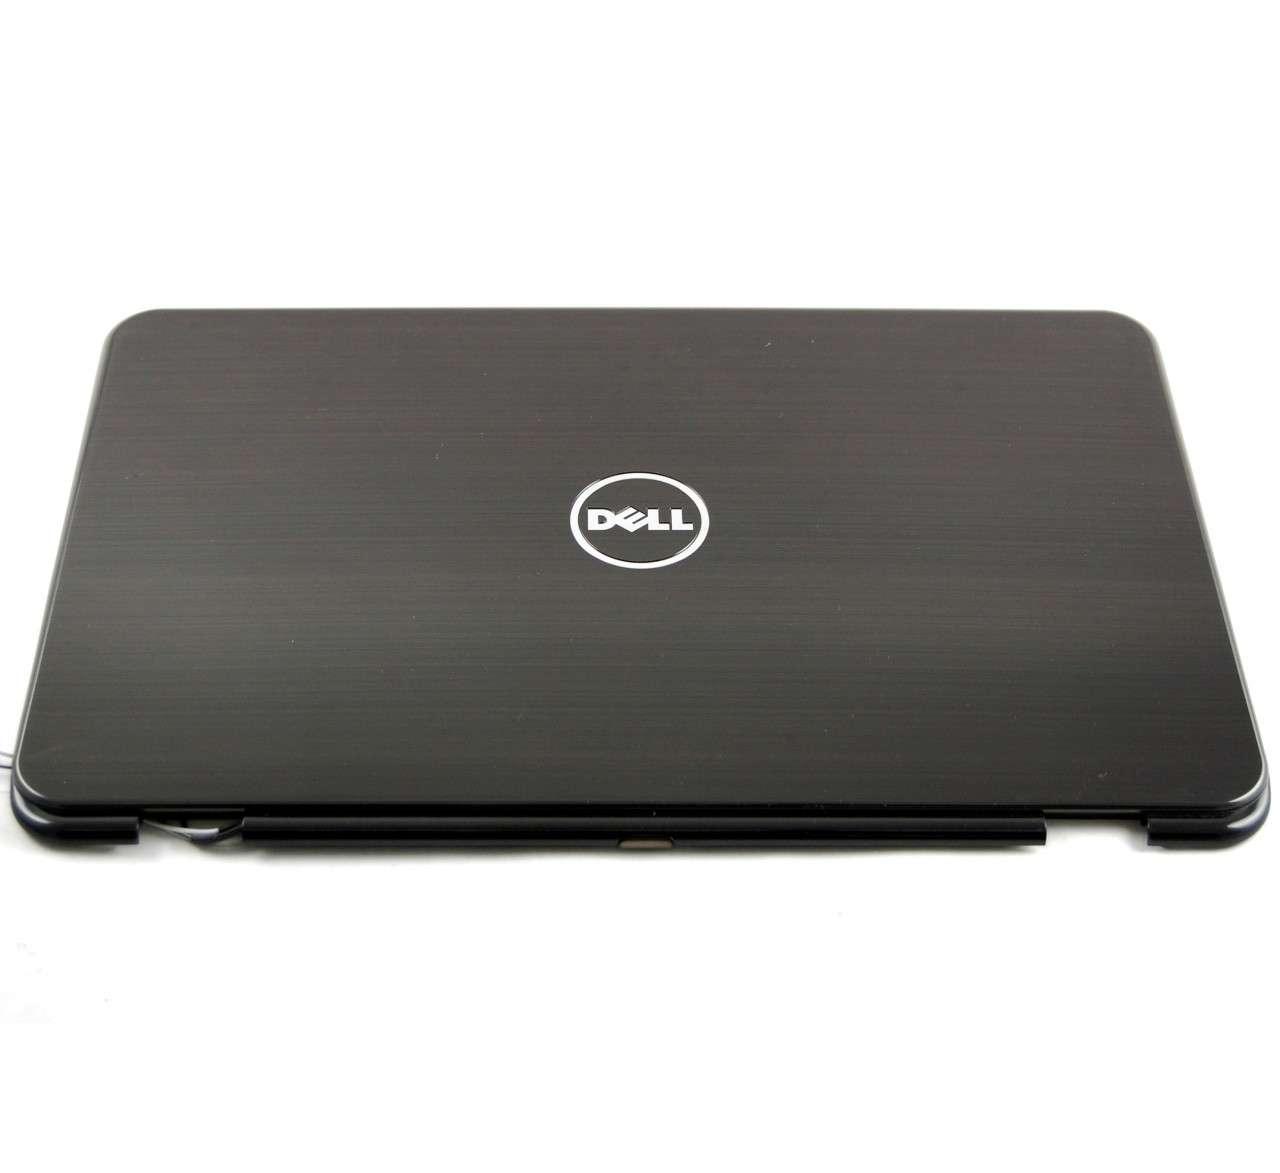 Capac Display BackCover Dell Inspiron N5110 Carcasa Display Neagra imagine powerlaptop.ro 2021